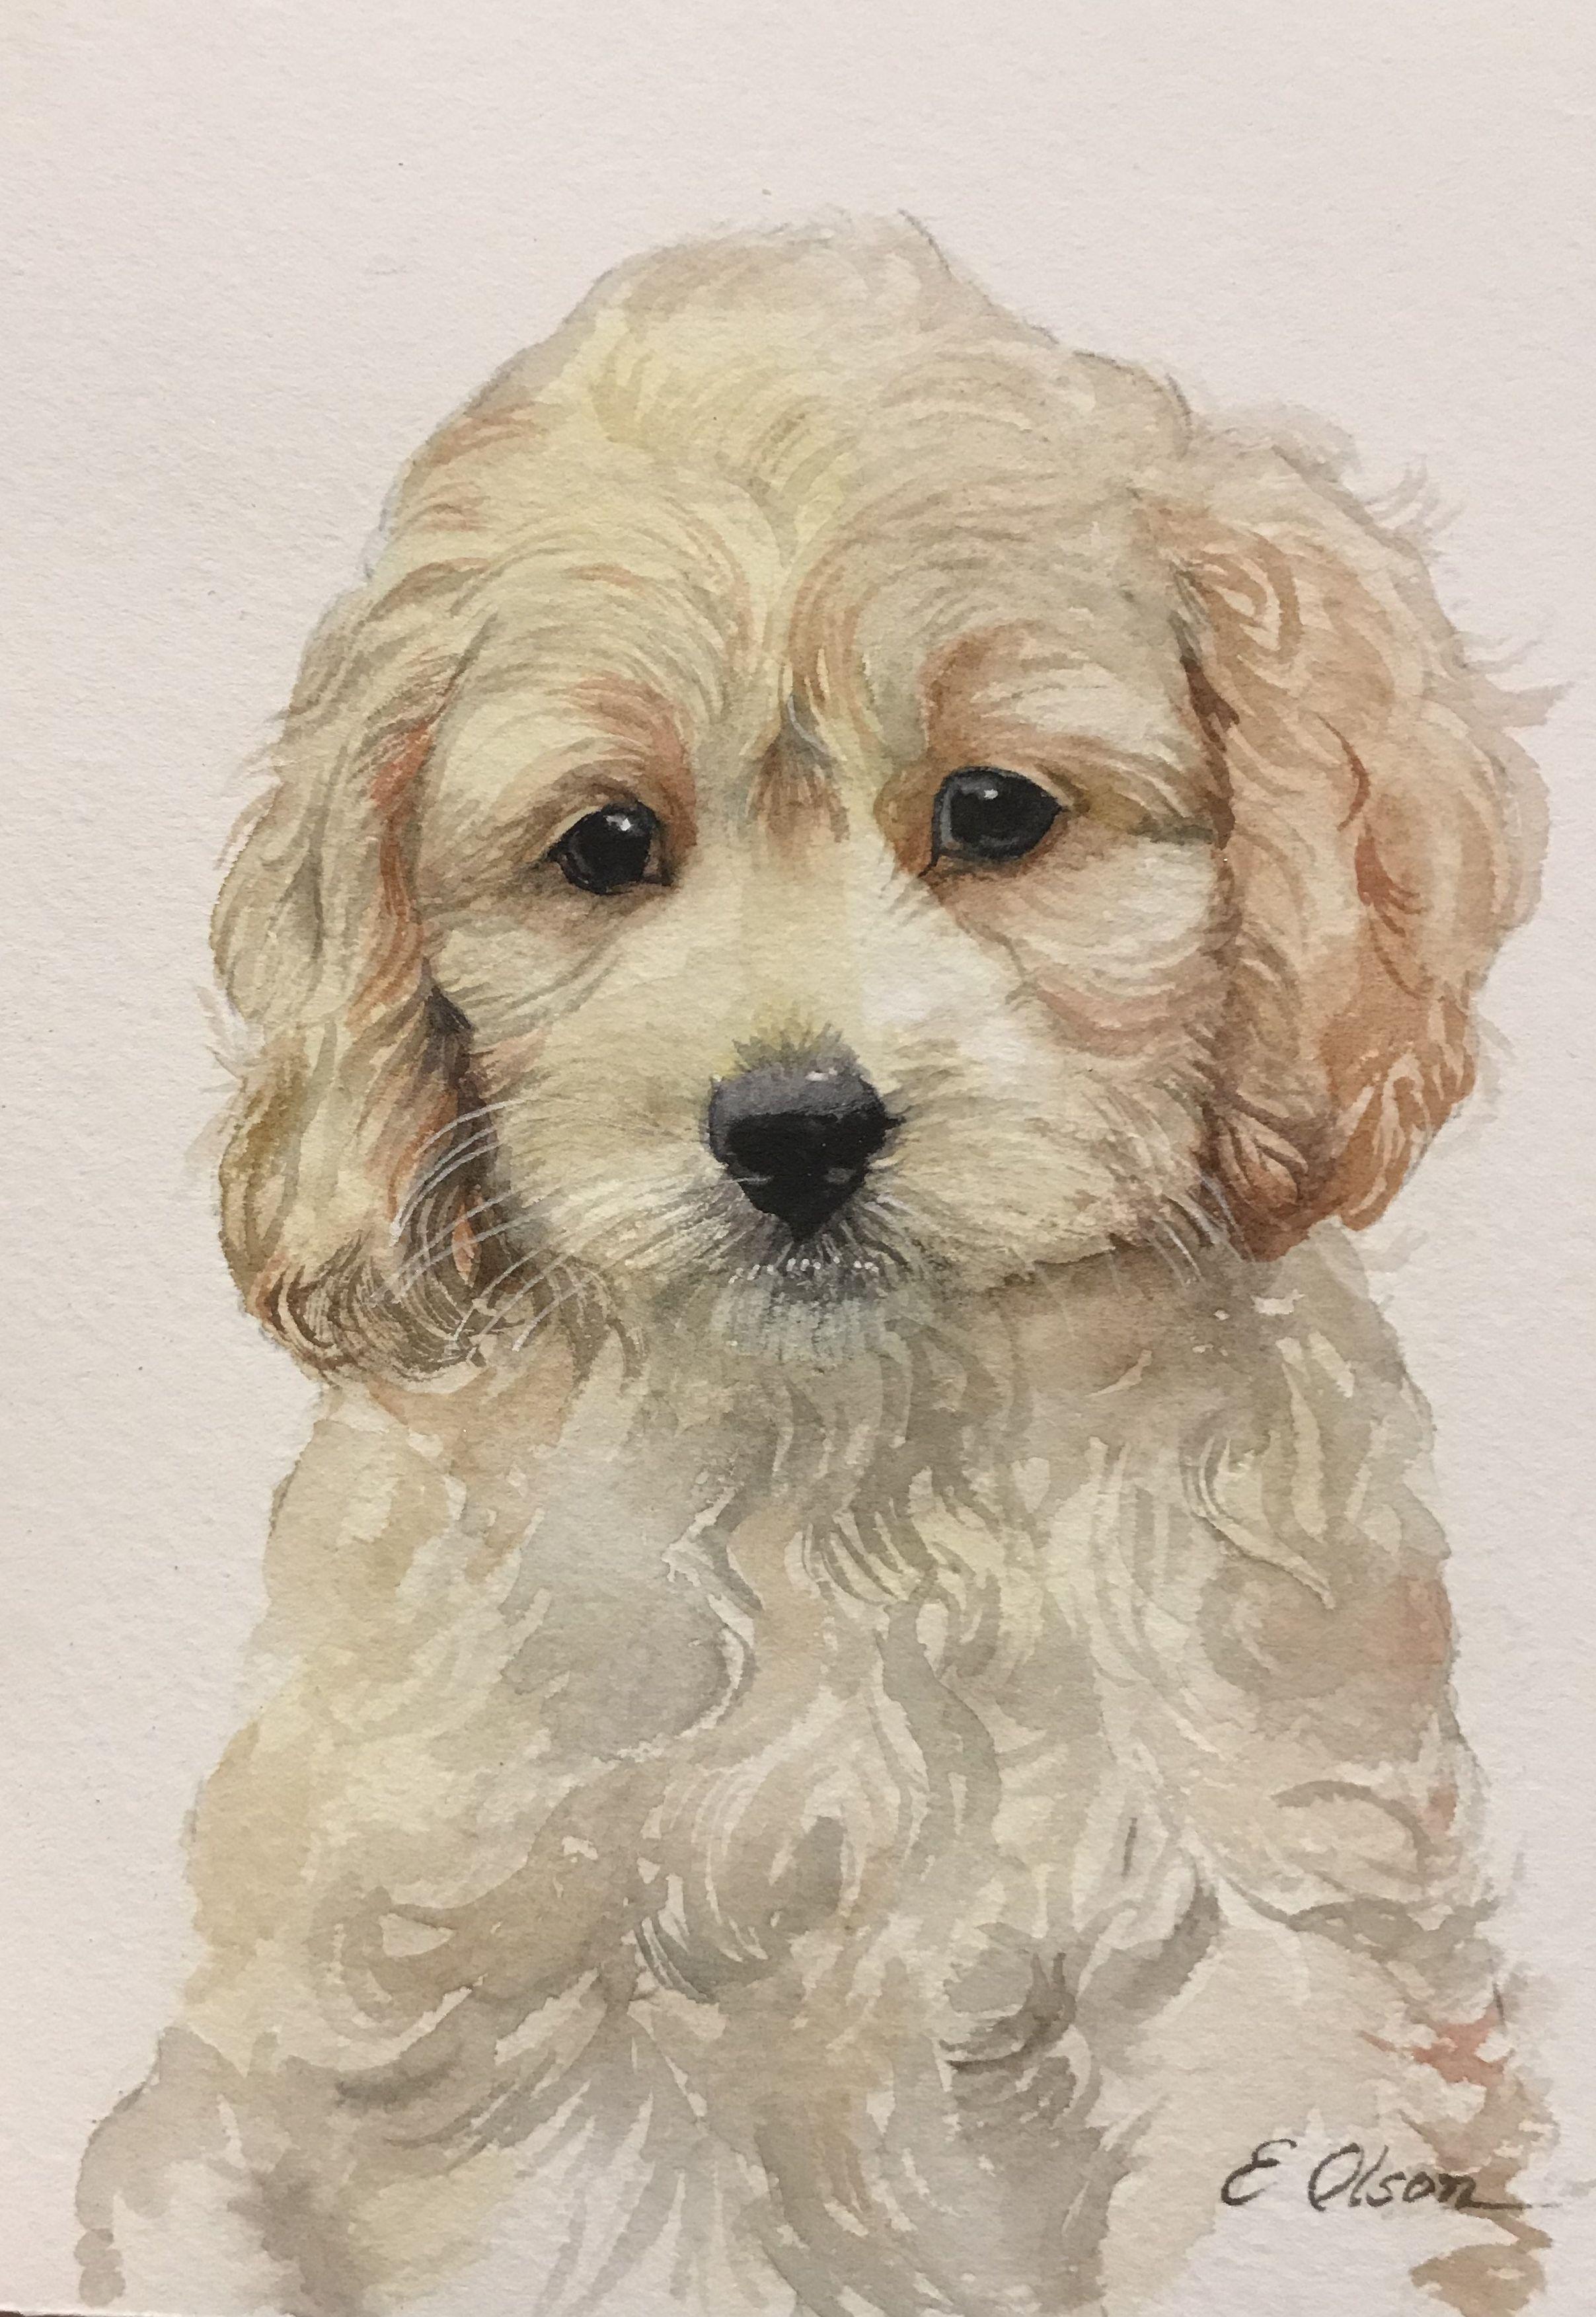 Puppy Nursery Animal Prints Set Of 4 Prints Watercolor Kids Etsy In 2020 Puppy Wall Art Watercolor Kids Room Puppy Nursery